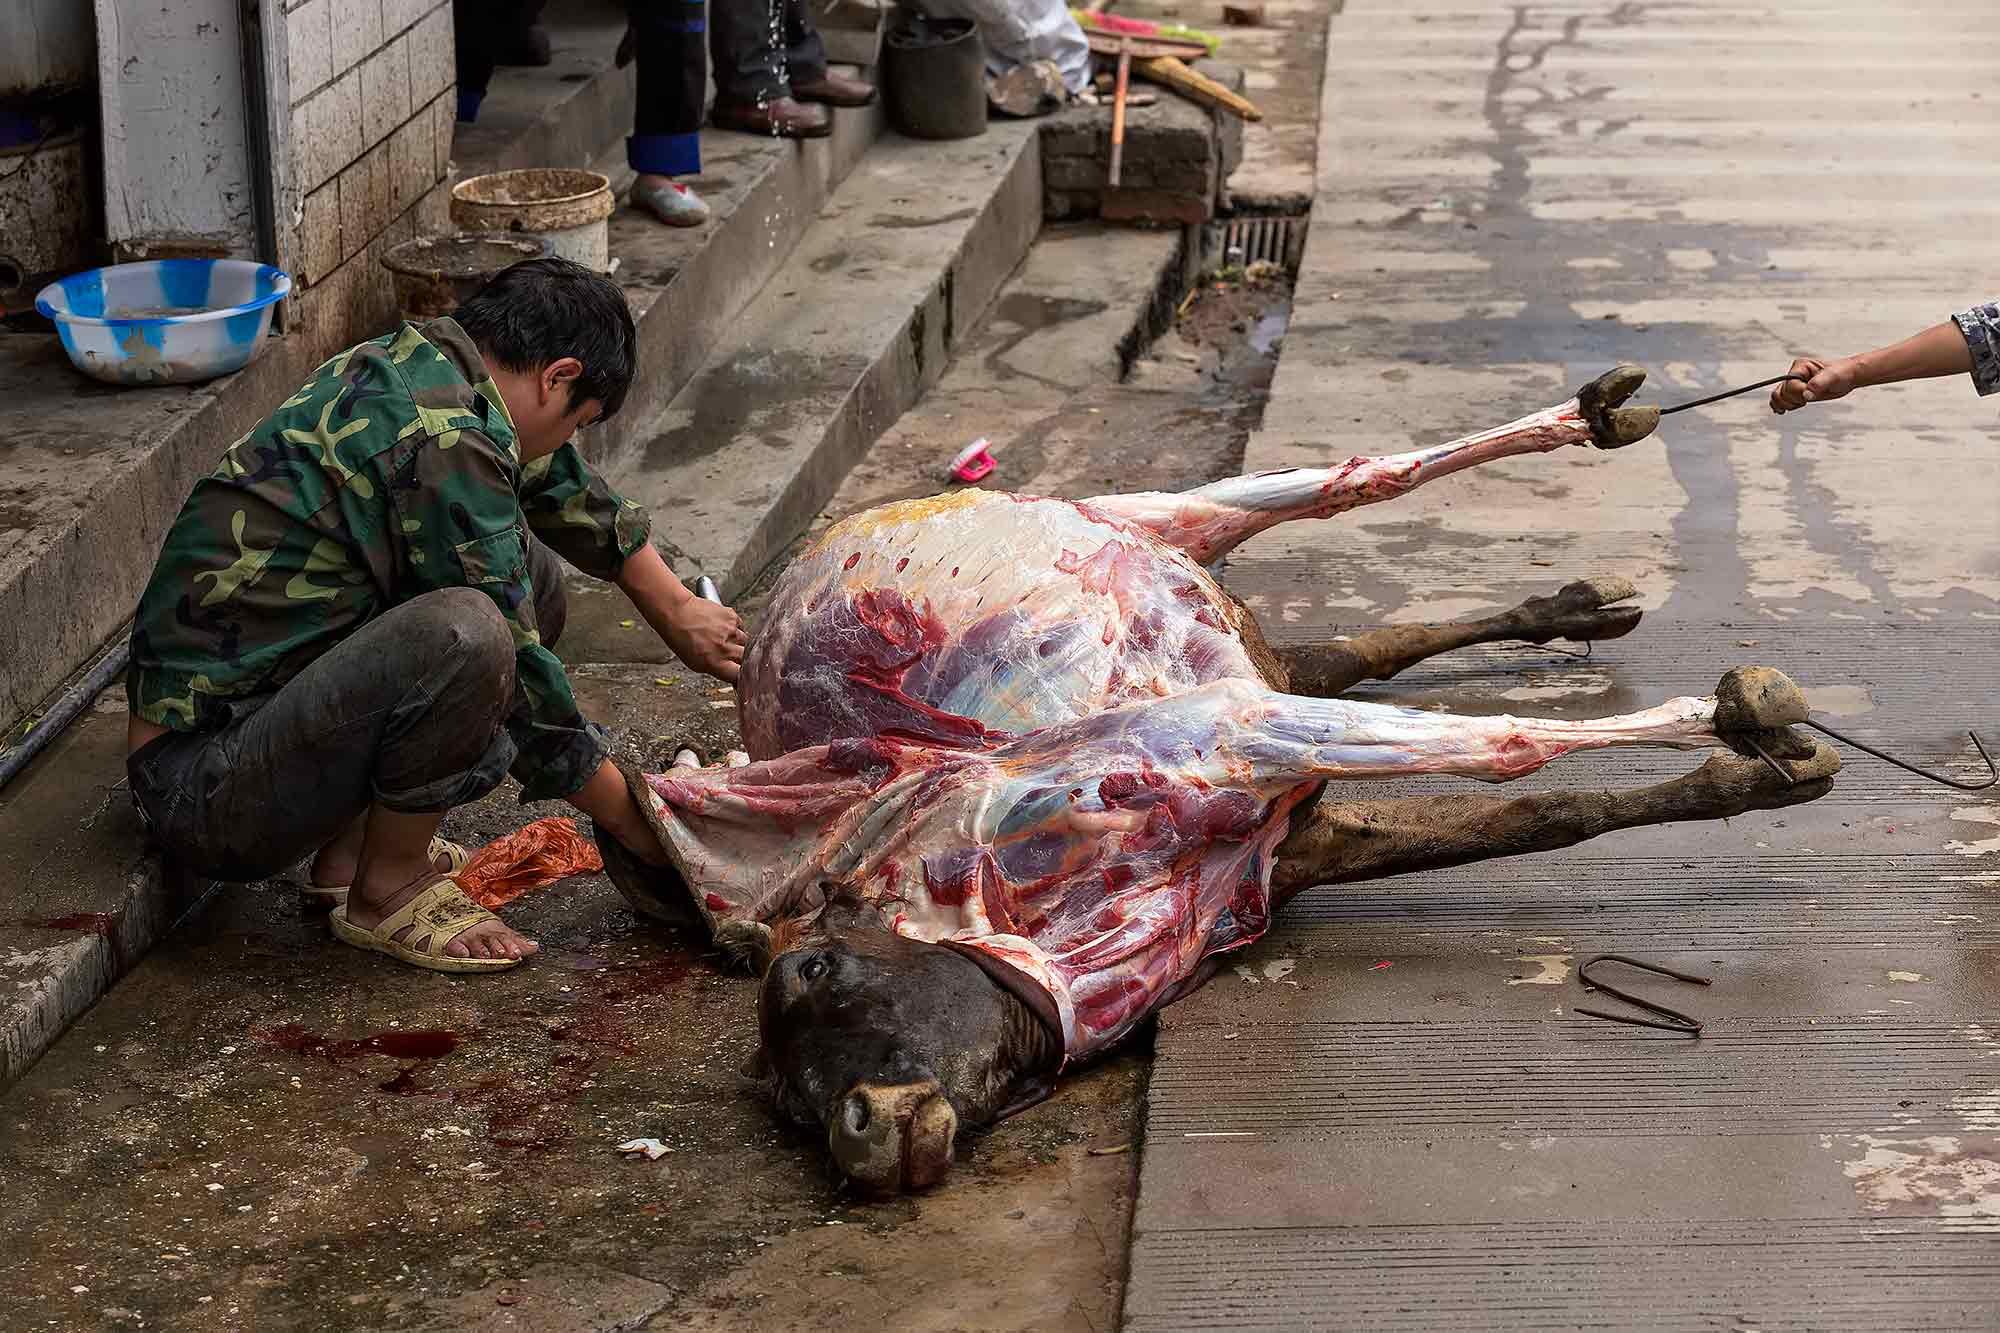 Skinning a cow in Duoyishu, Yunnan. © Ulli Maier & Nisa Maier